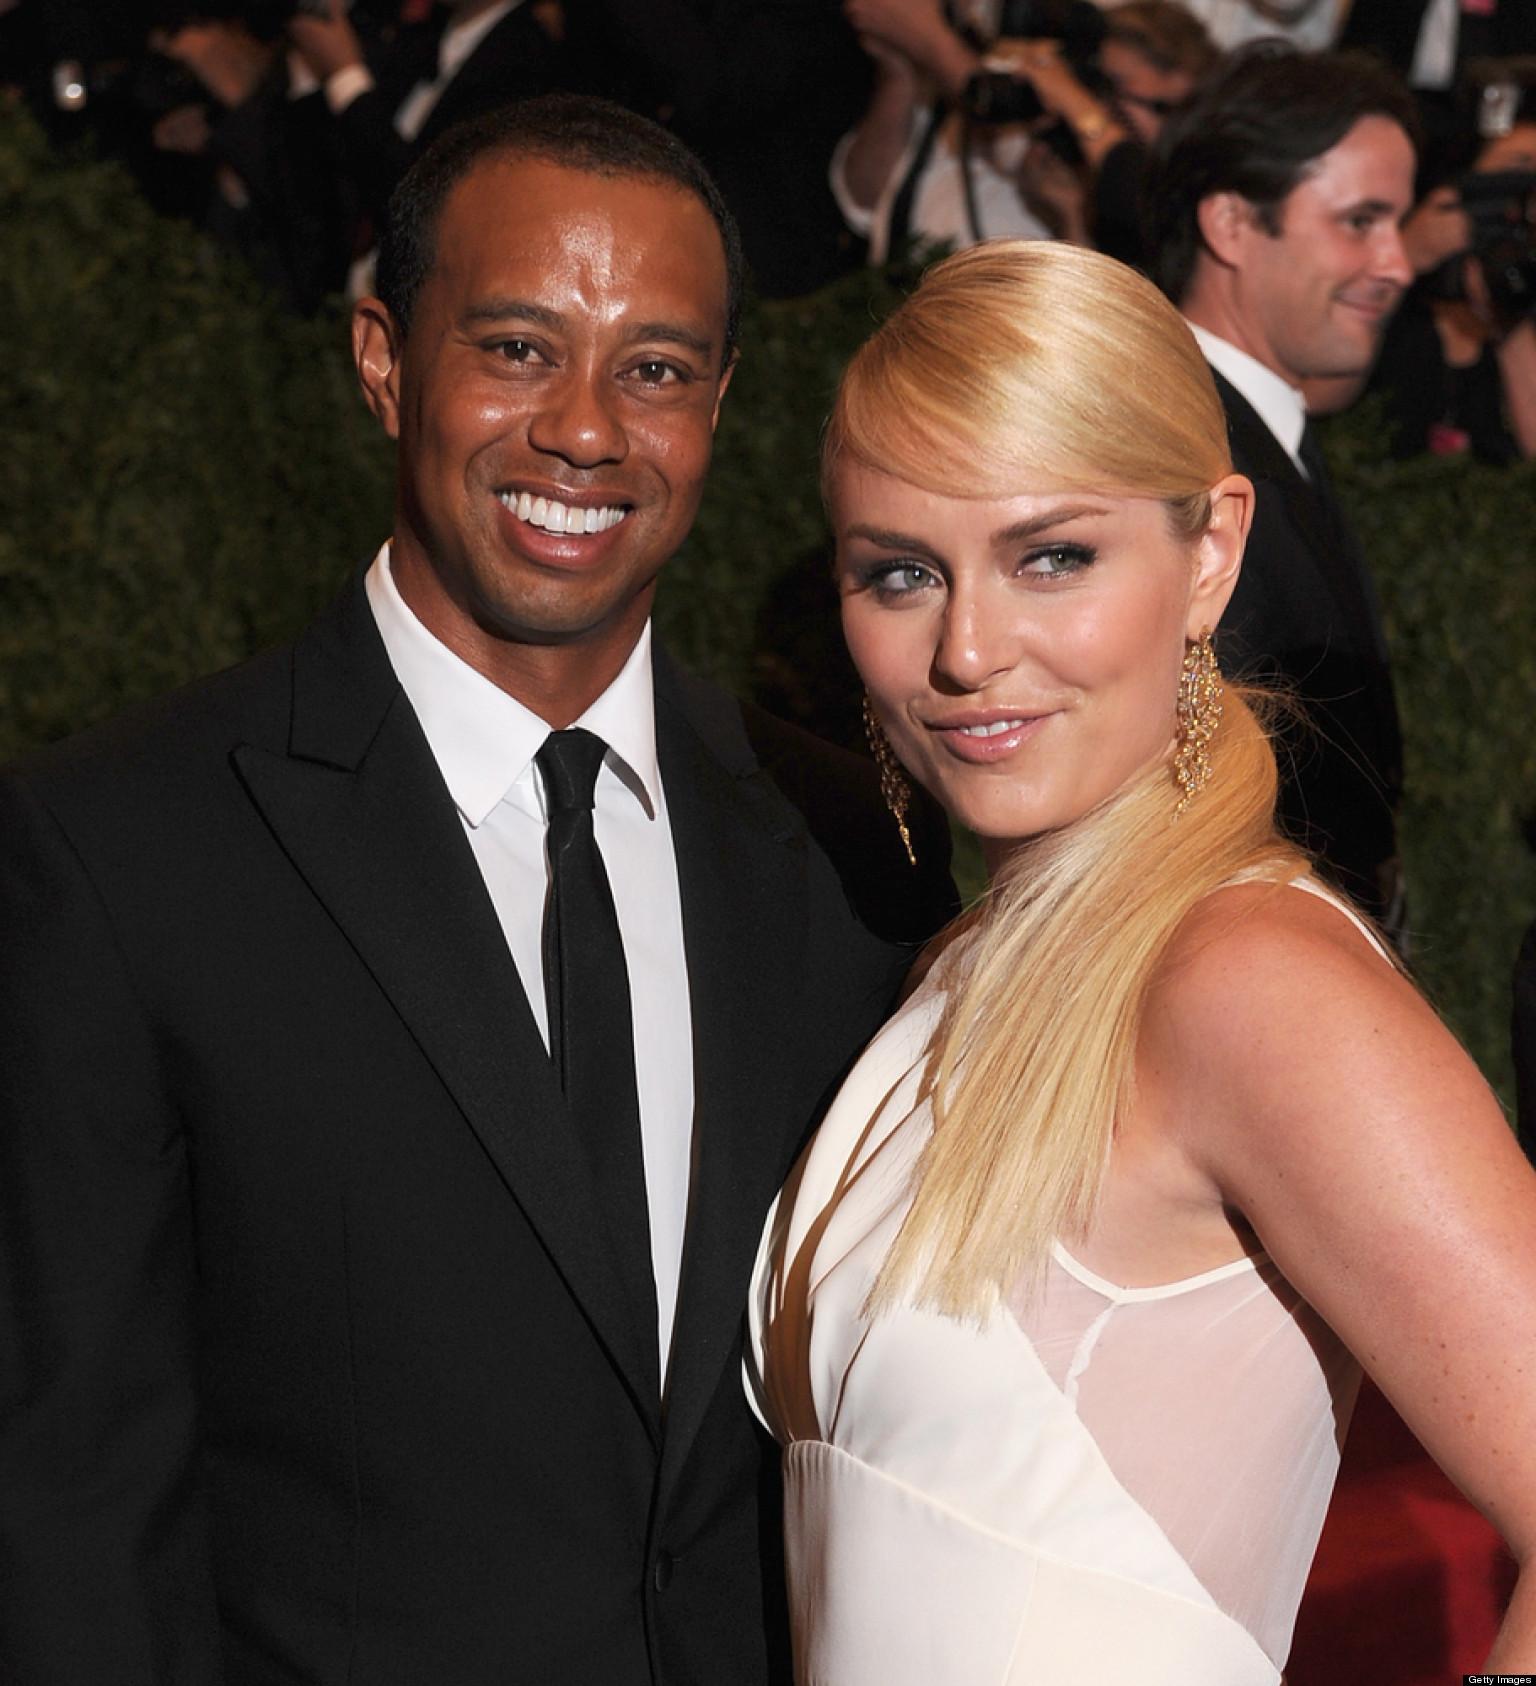 Tiger Woods, Lindsey Vonn Photographed In Las Vegas At